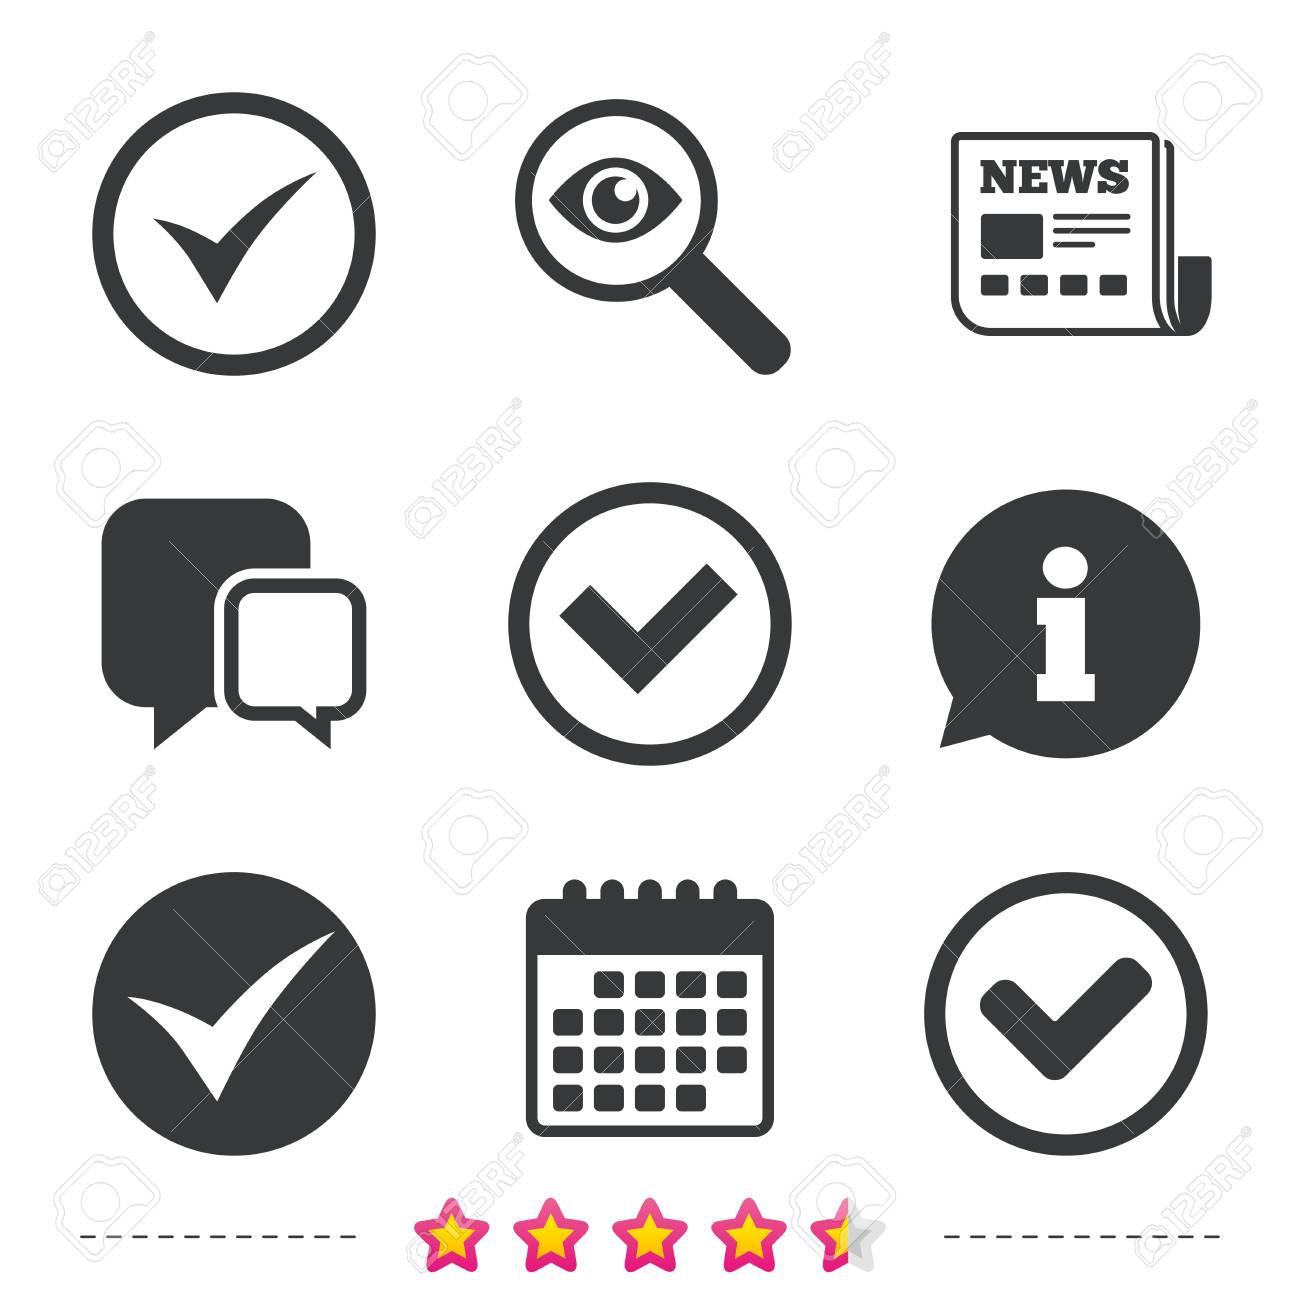 Check icons  Checkbox confirm circle sign symbols  Newspaper,